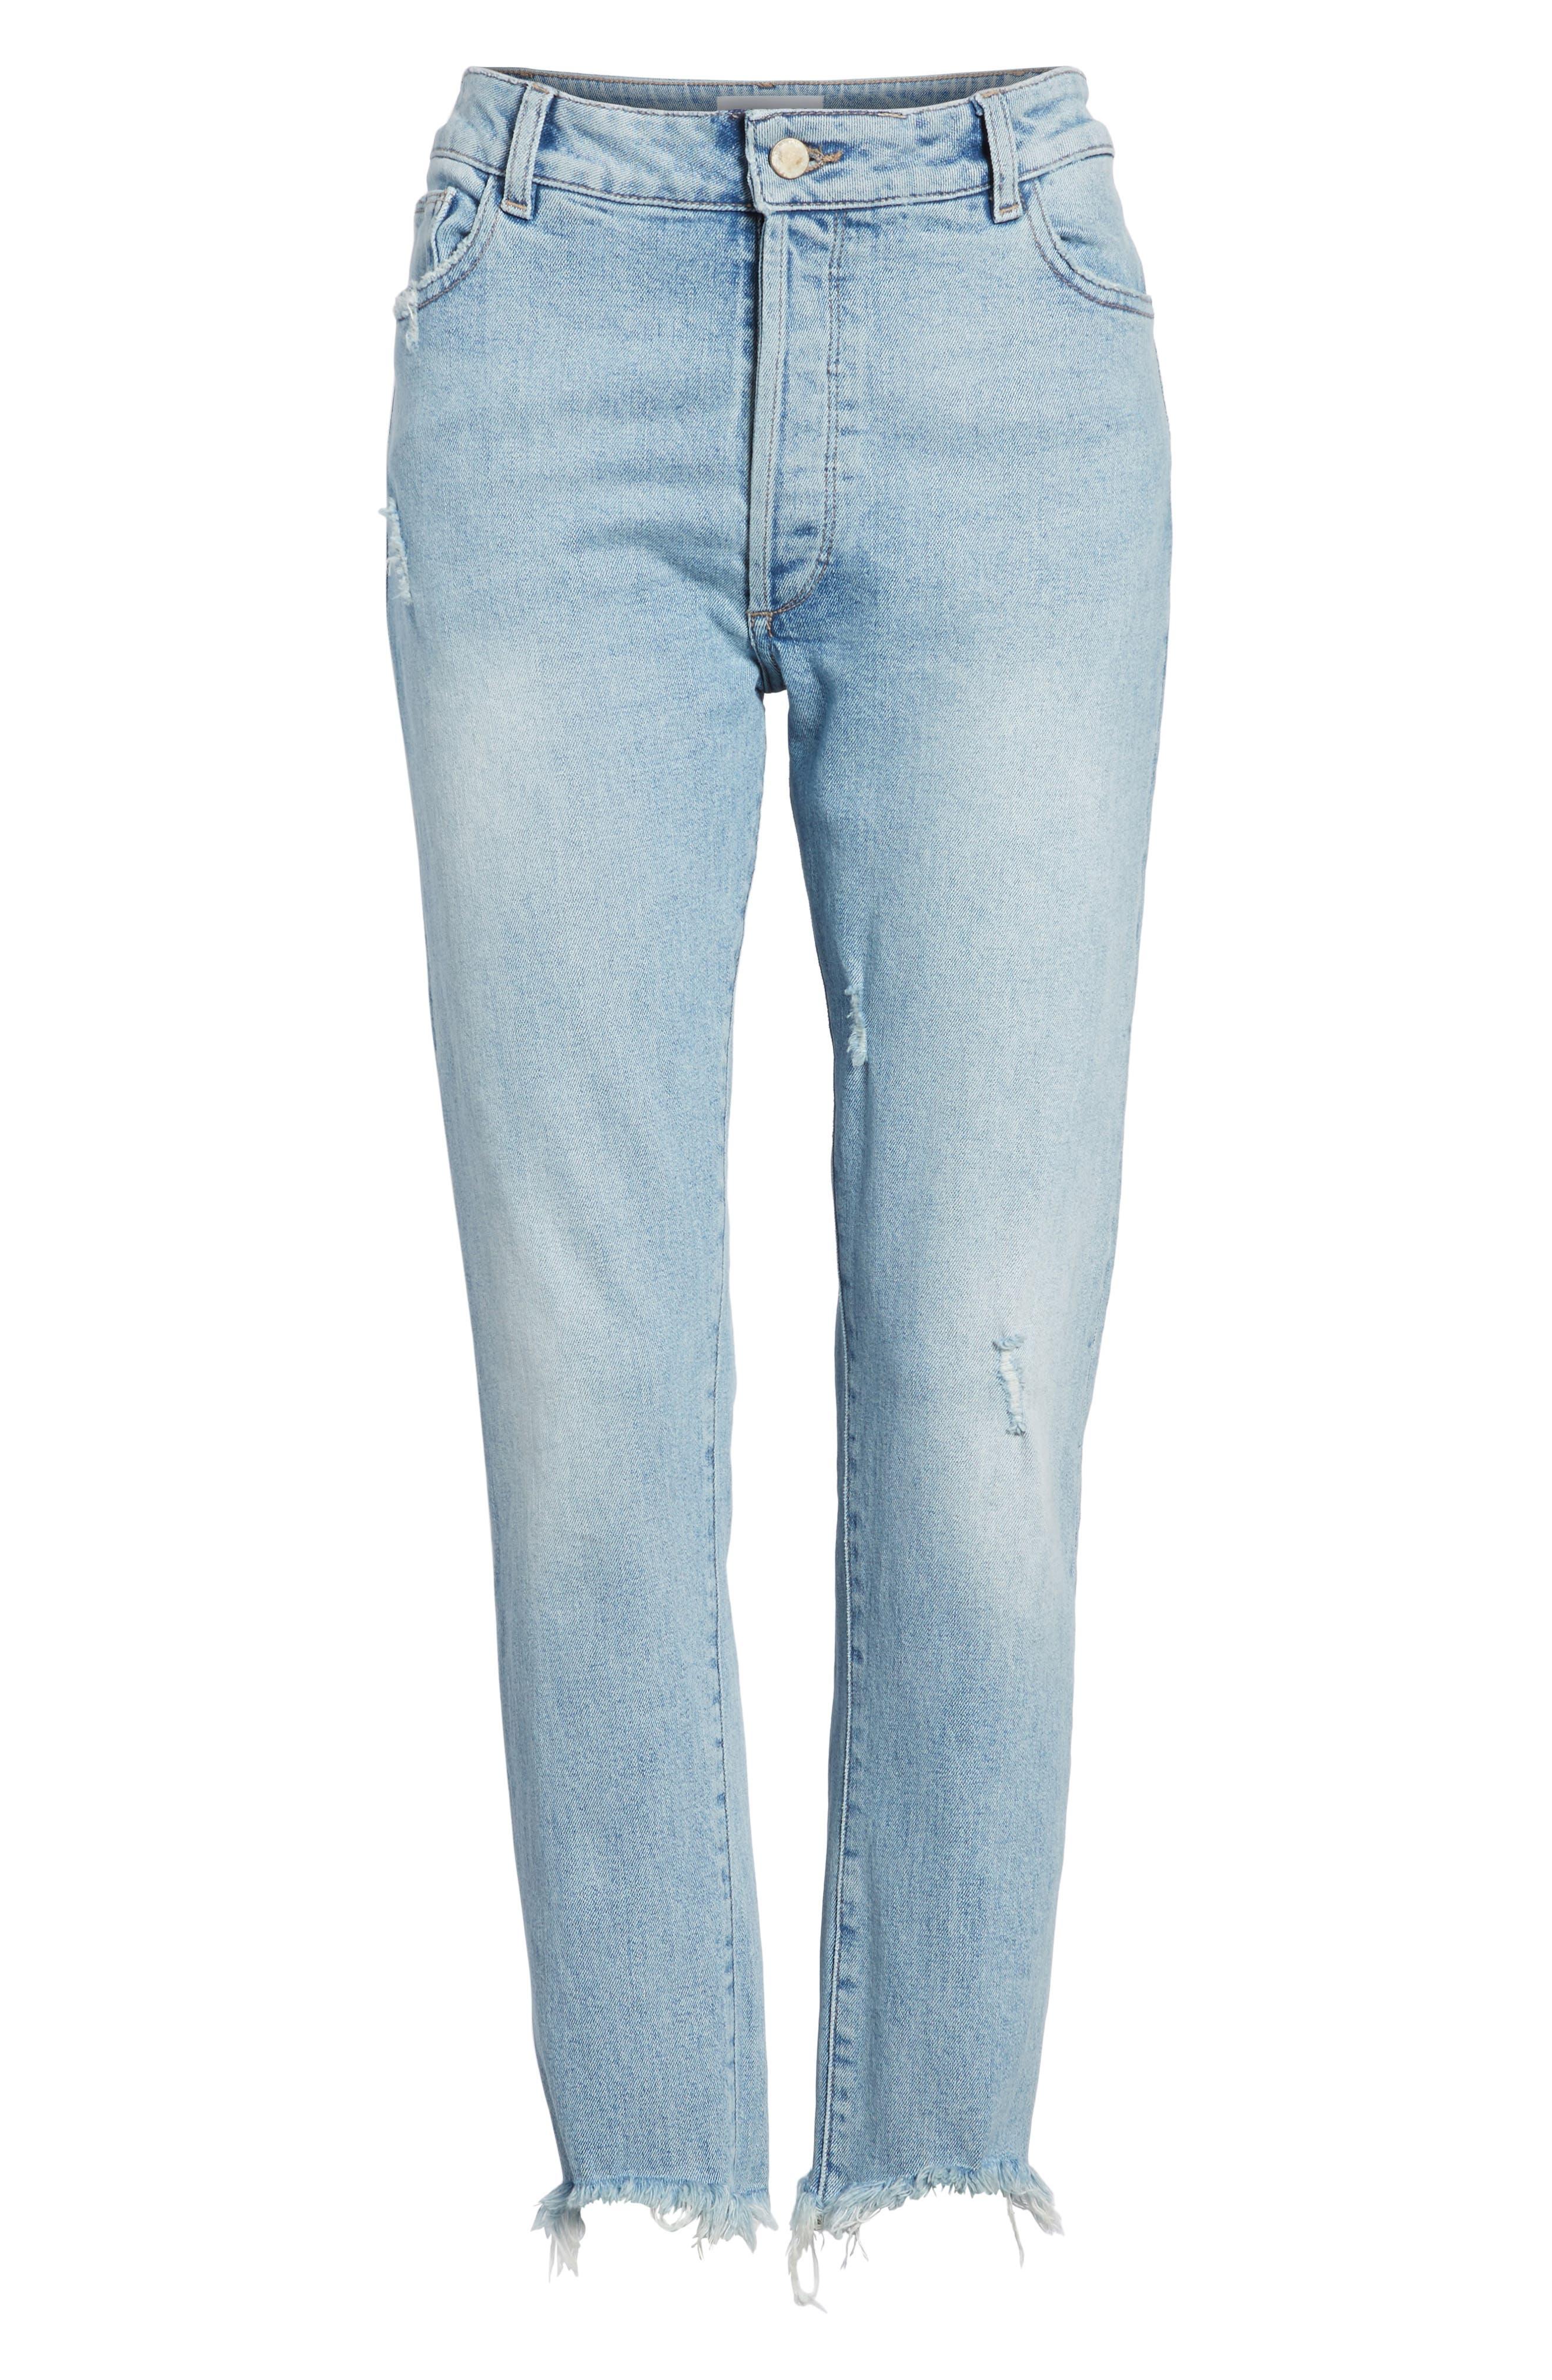 Bella Vintage Crop Slim Jeans,                             Alternate thumbnail 7, color,                             430